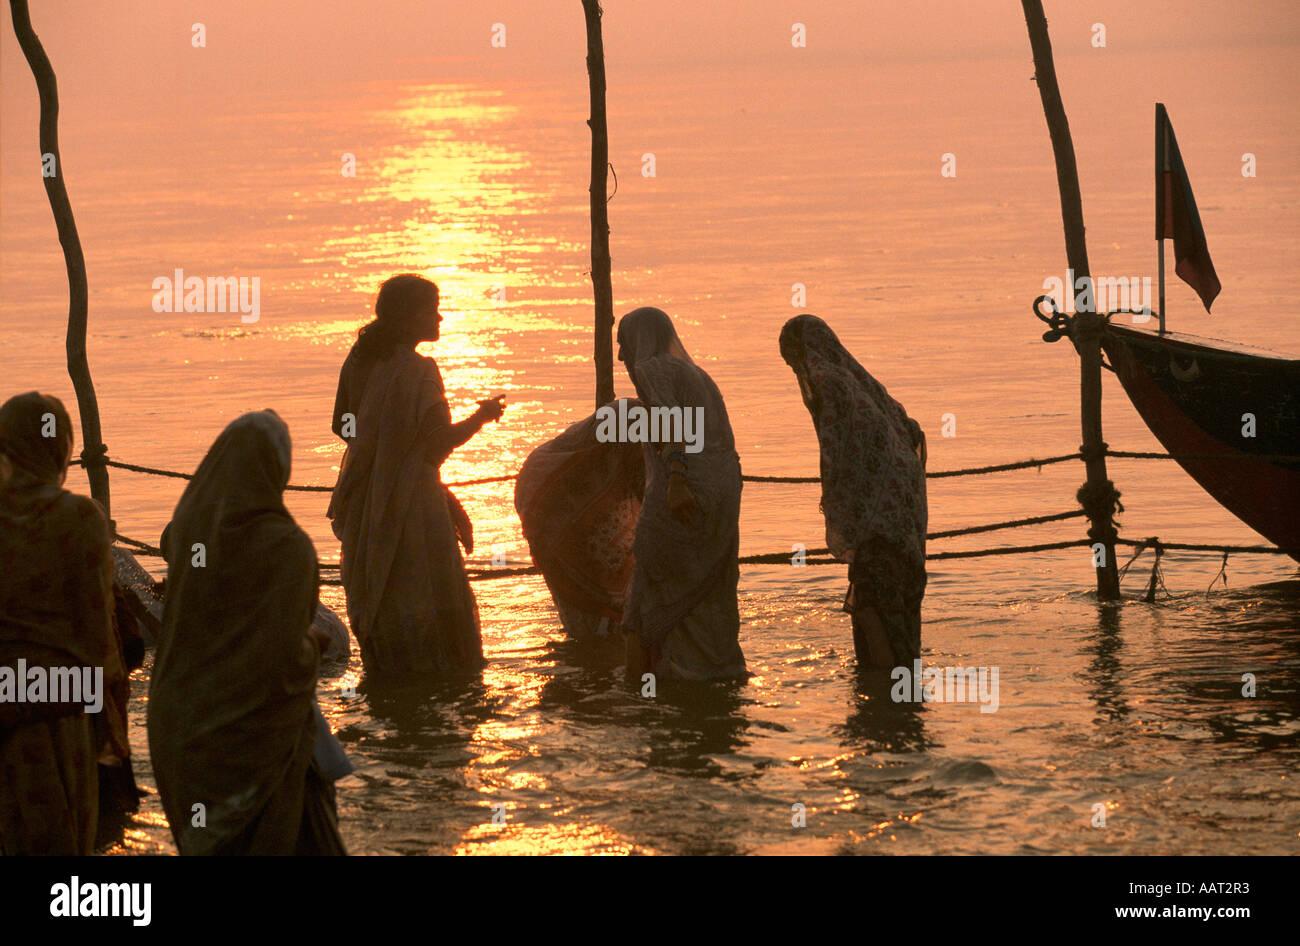 KUMBH MELA INDIA 2001 como el sol sobre el Kumbh Mela el flujo de peregrinos próximos MANTIENE AL GANGES 2001 Foto de stock